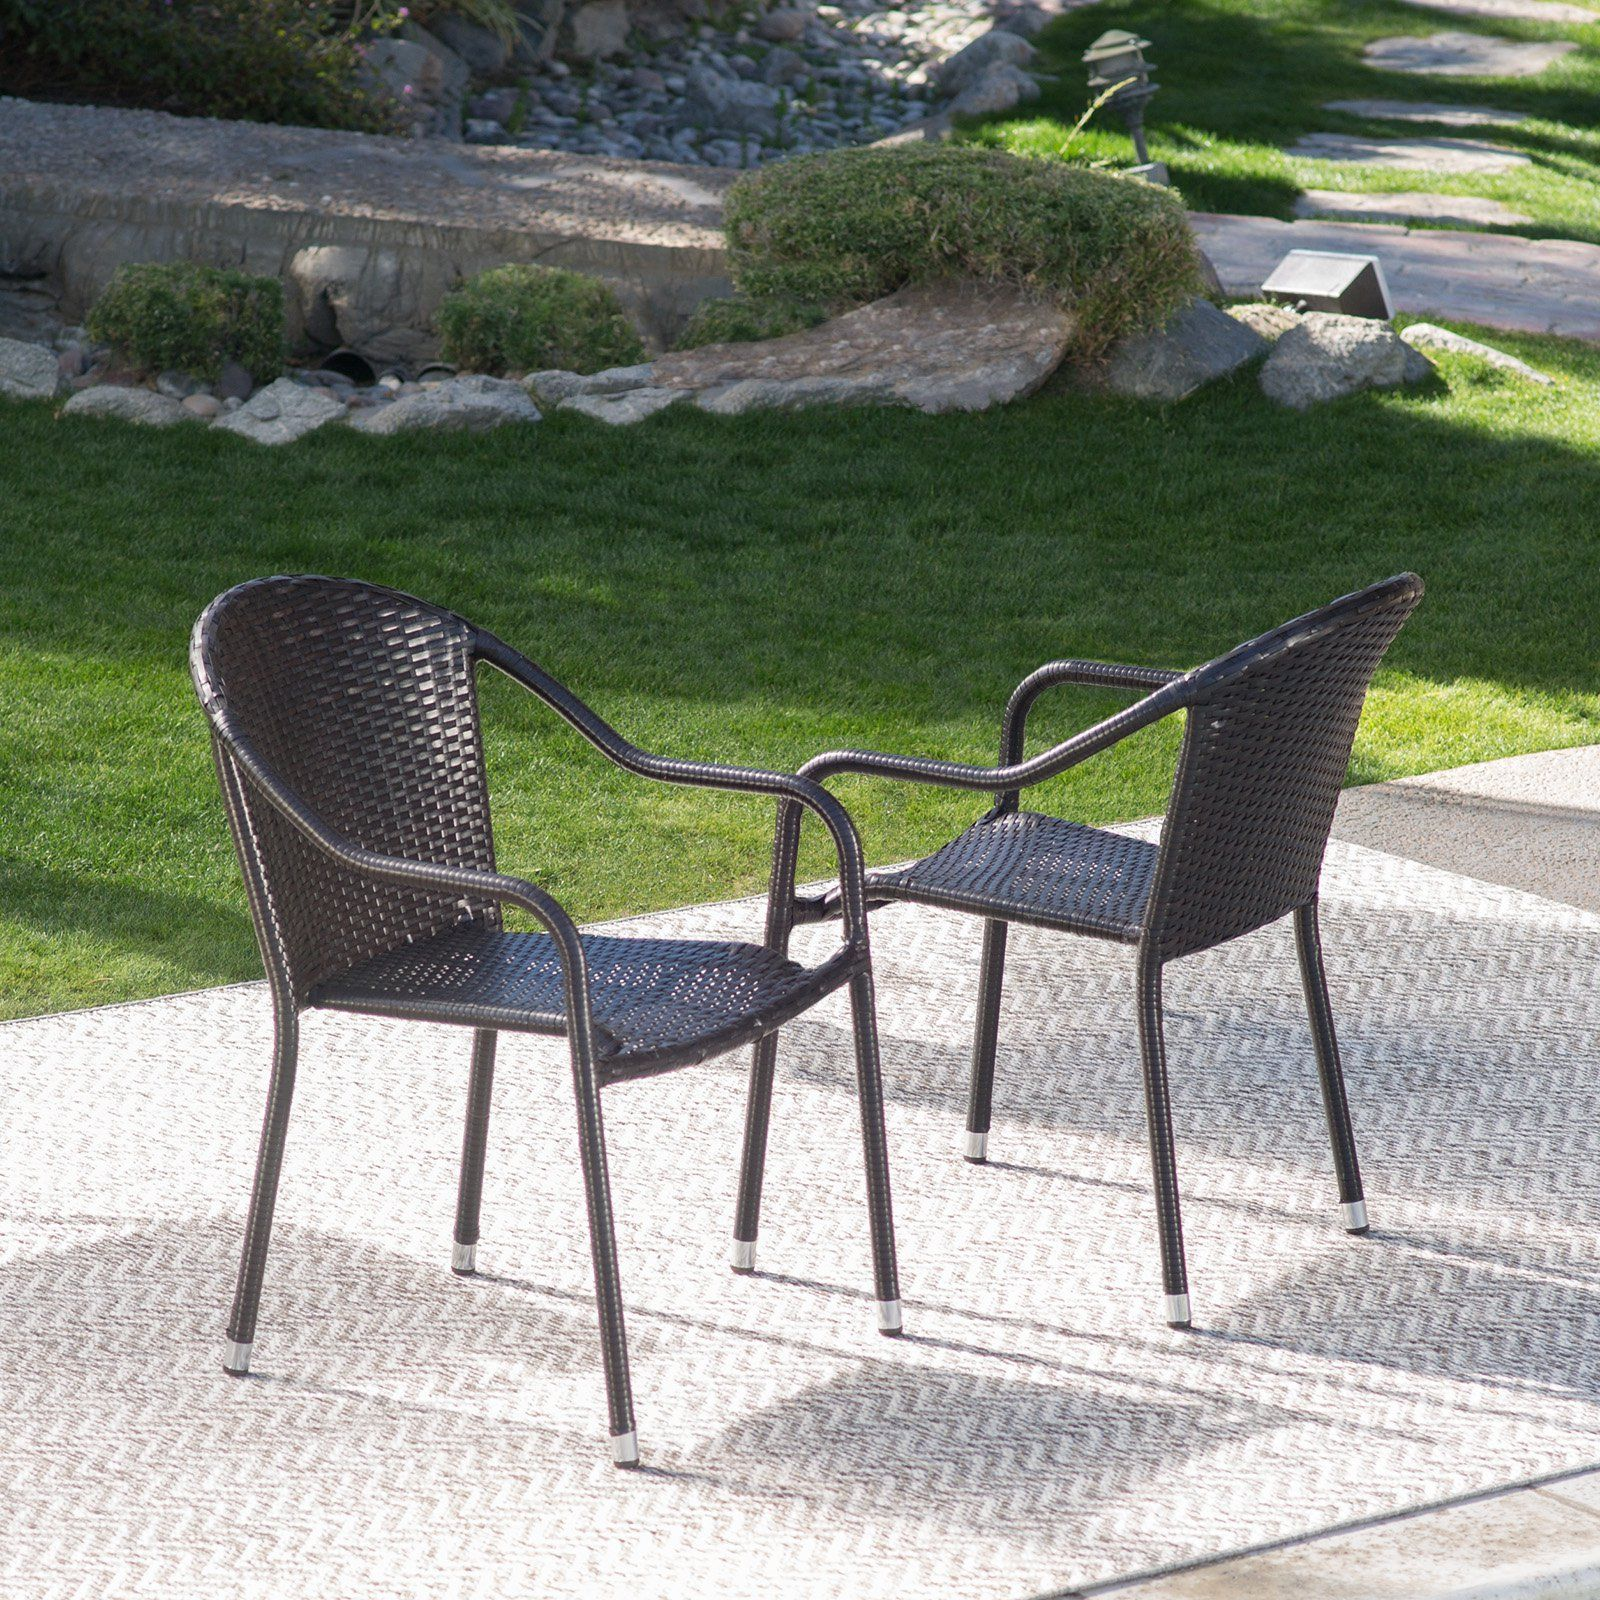 Coral Coast Berea Outdoor Wicker Stackable Chair Outdoor Wicker